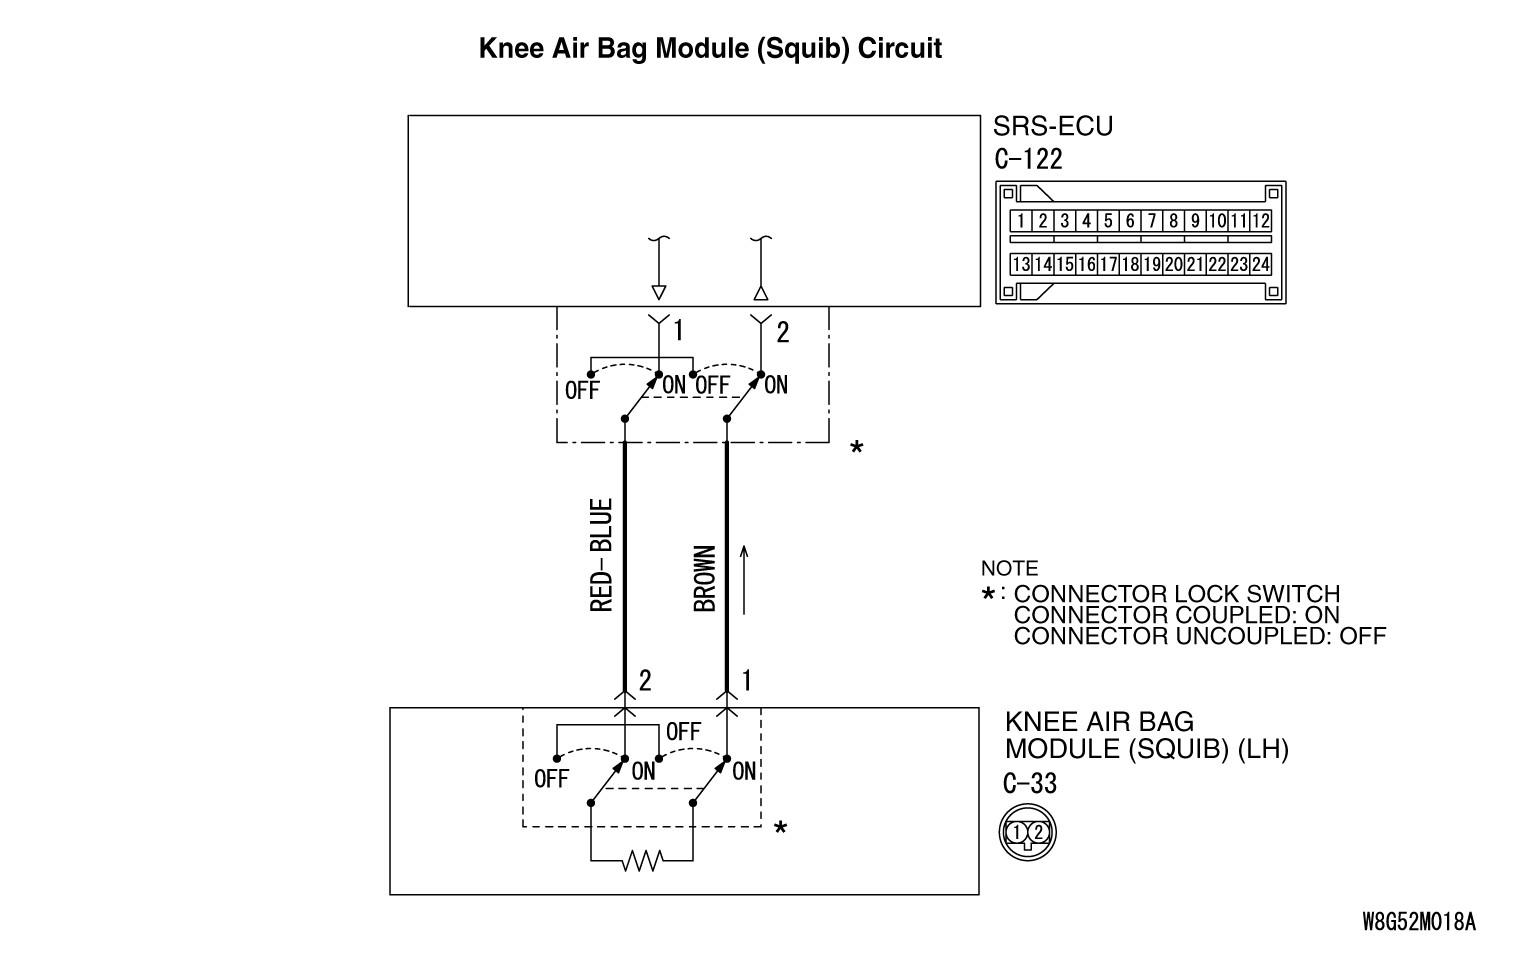 DTC B1B13 Driver s Knee Air Bag Squib System Short Circuit Between Squib Circuit Terminals